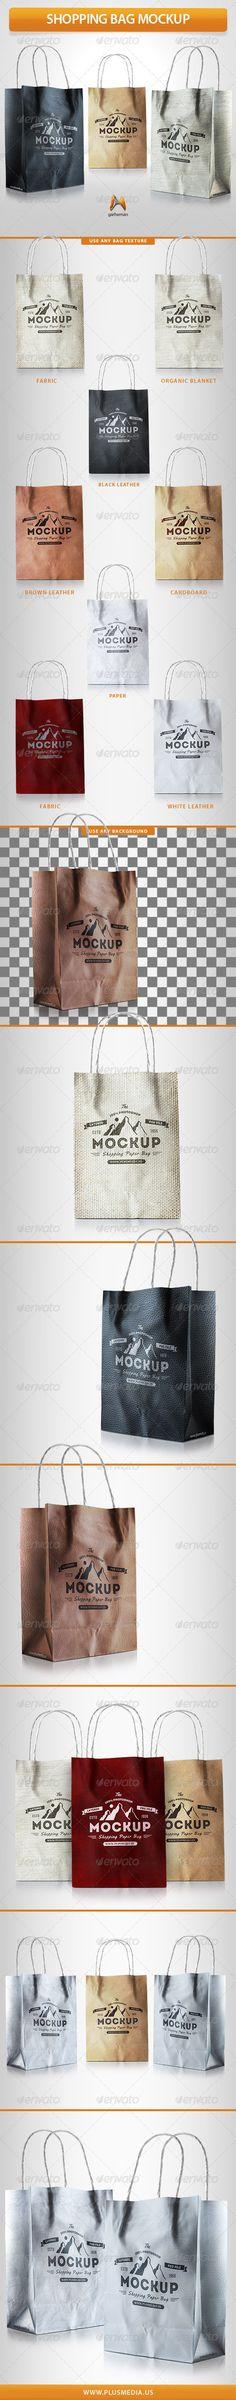 Download 19 Zzz Bags Ideas Shopping Bag Design Paper Bag Design Packaging Design